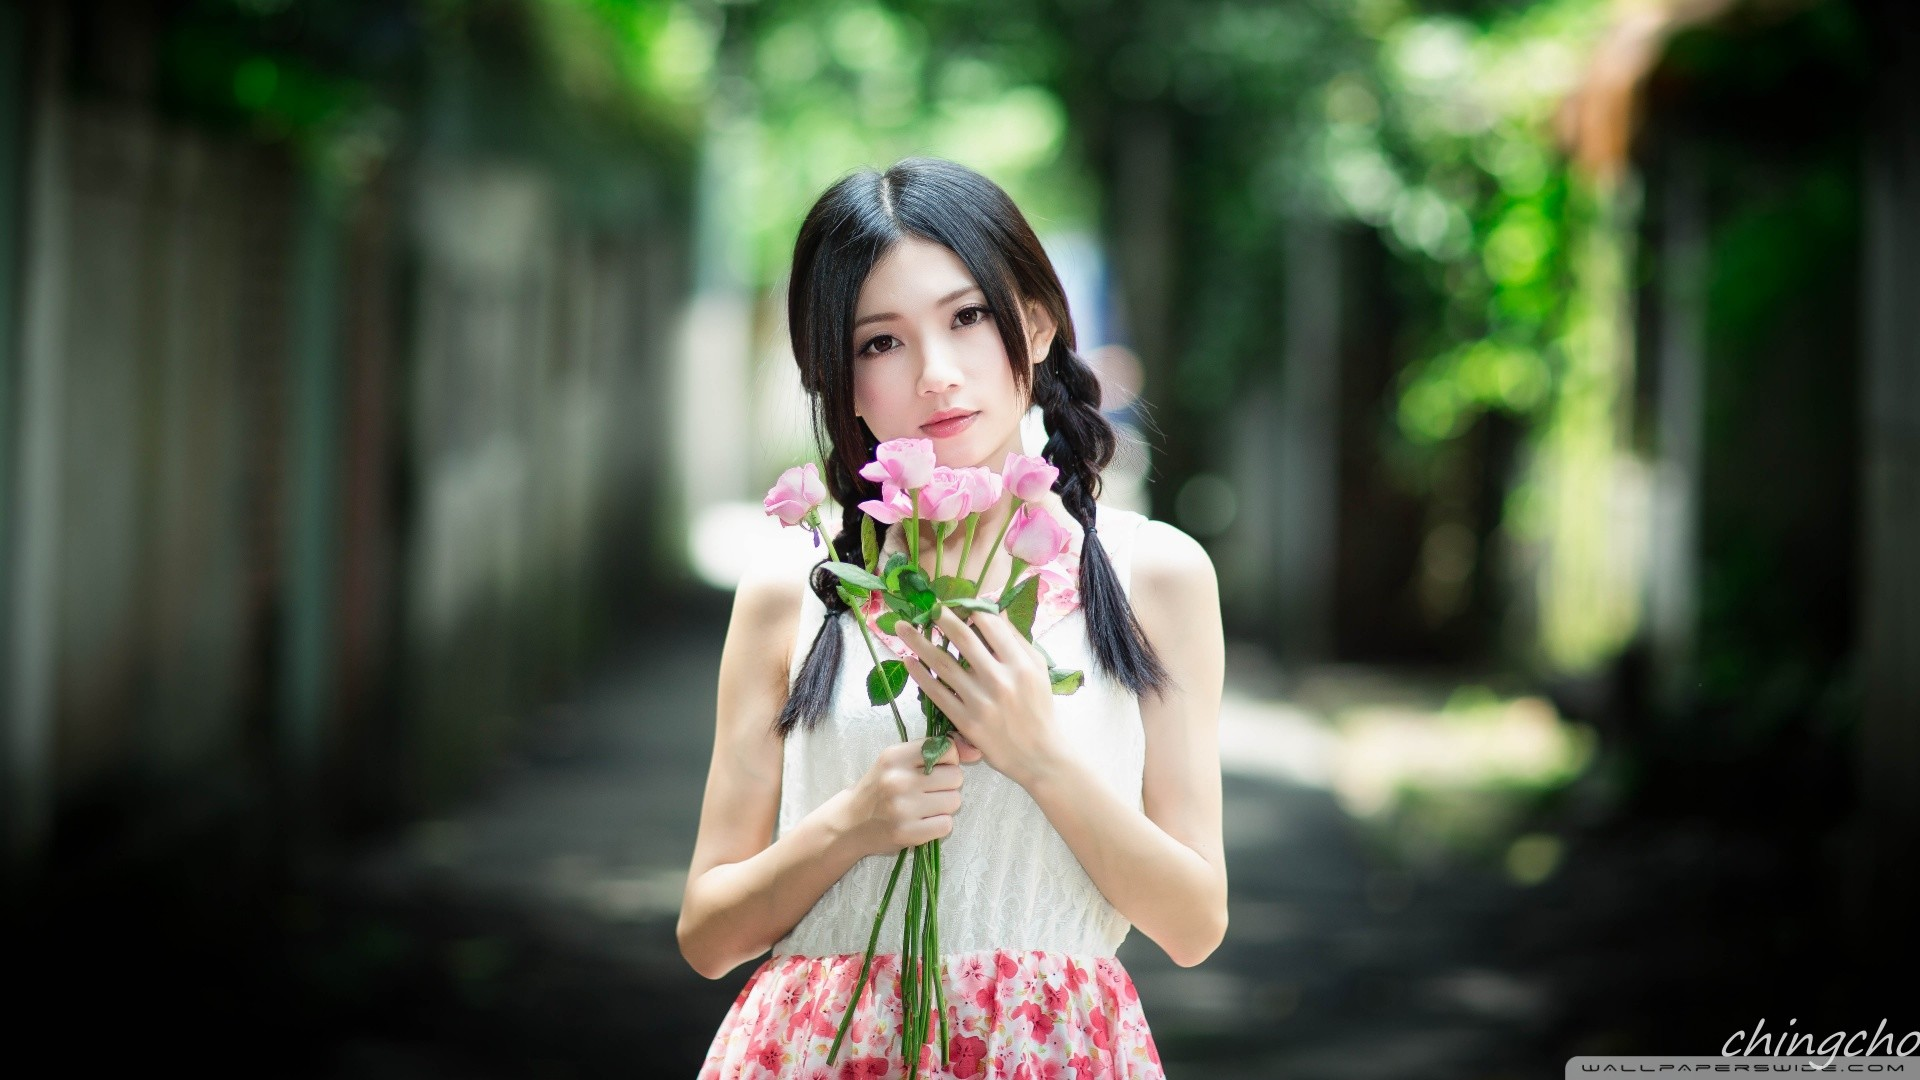 Hd wallpapers 1080p girls 71 images - Very cute girl wallpaper hd ...